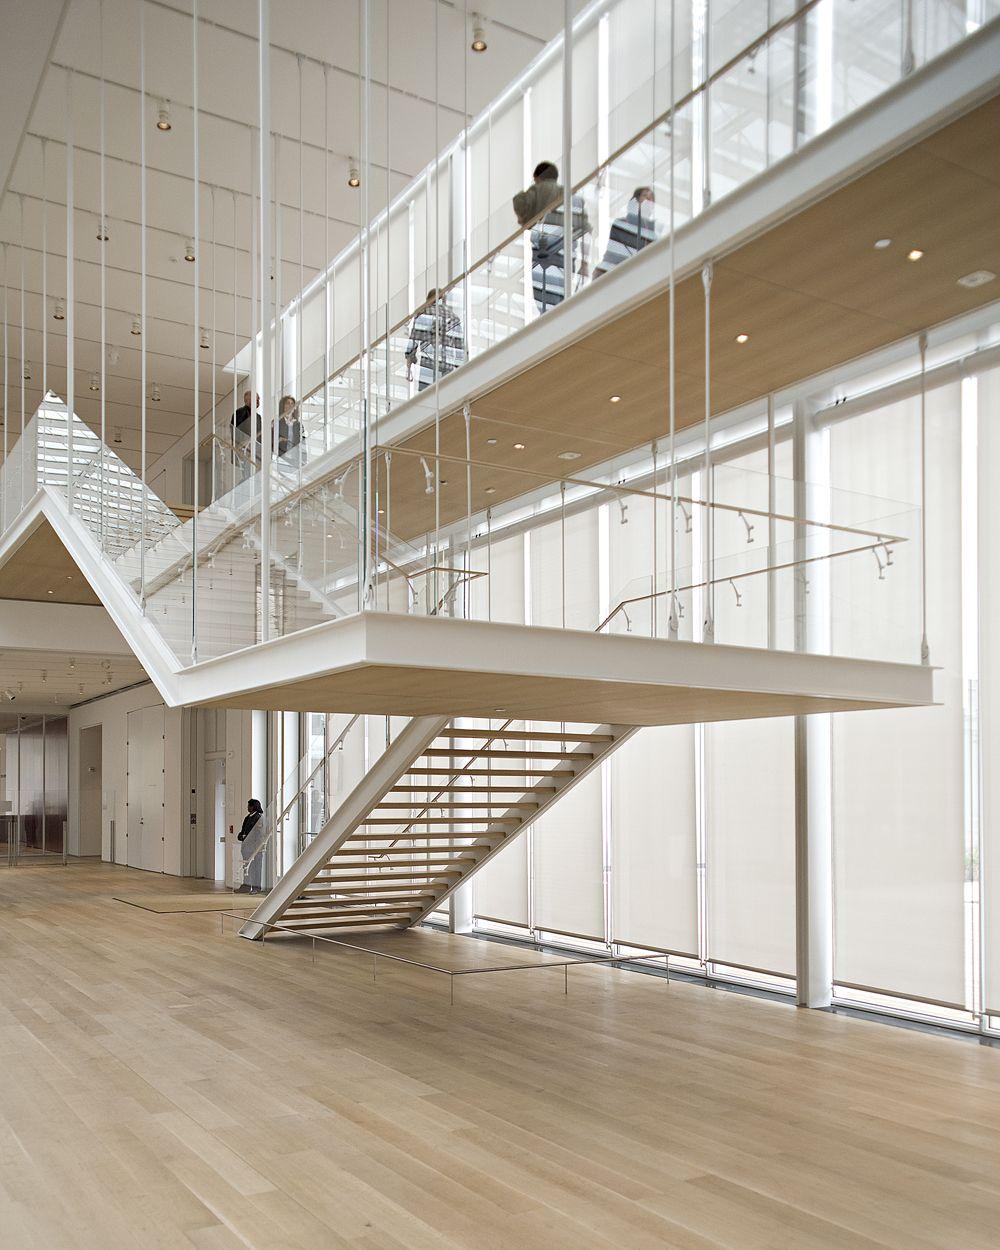 Chicago Modern Architecture Design: Renzo Piano - Art Institute Of Chicago